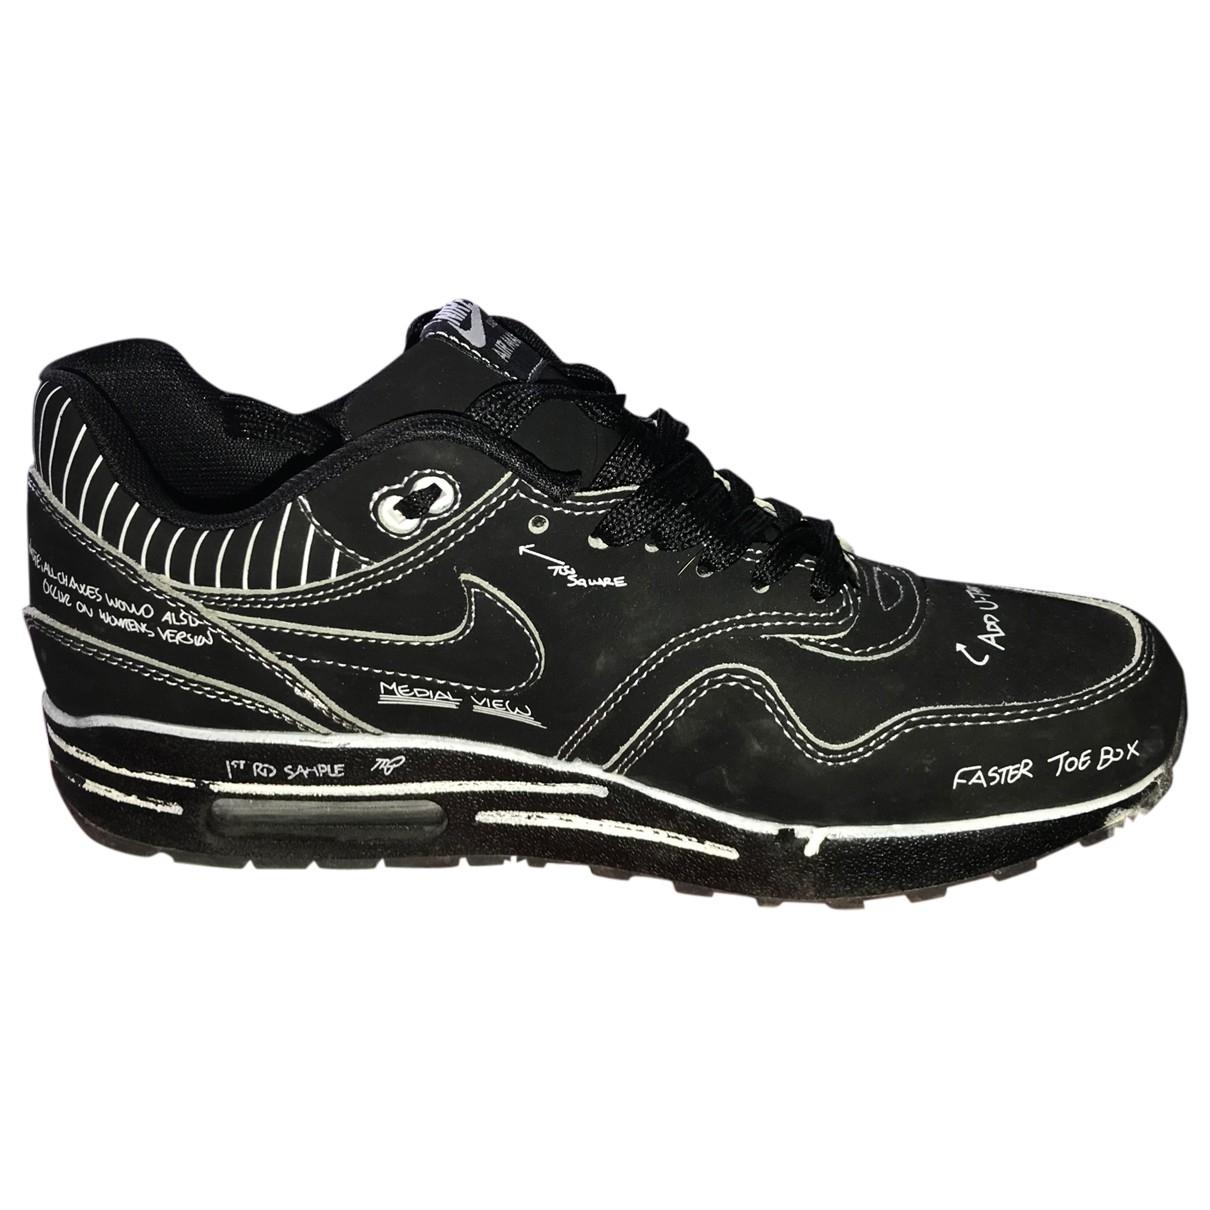 Nike Air Max 1 Black Cloth Trainers for Men 42.5 EU